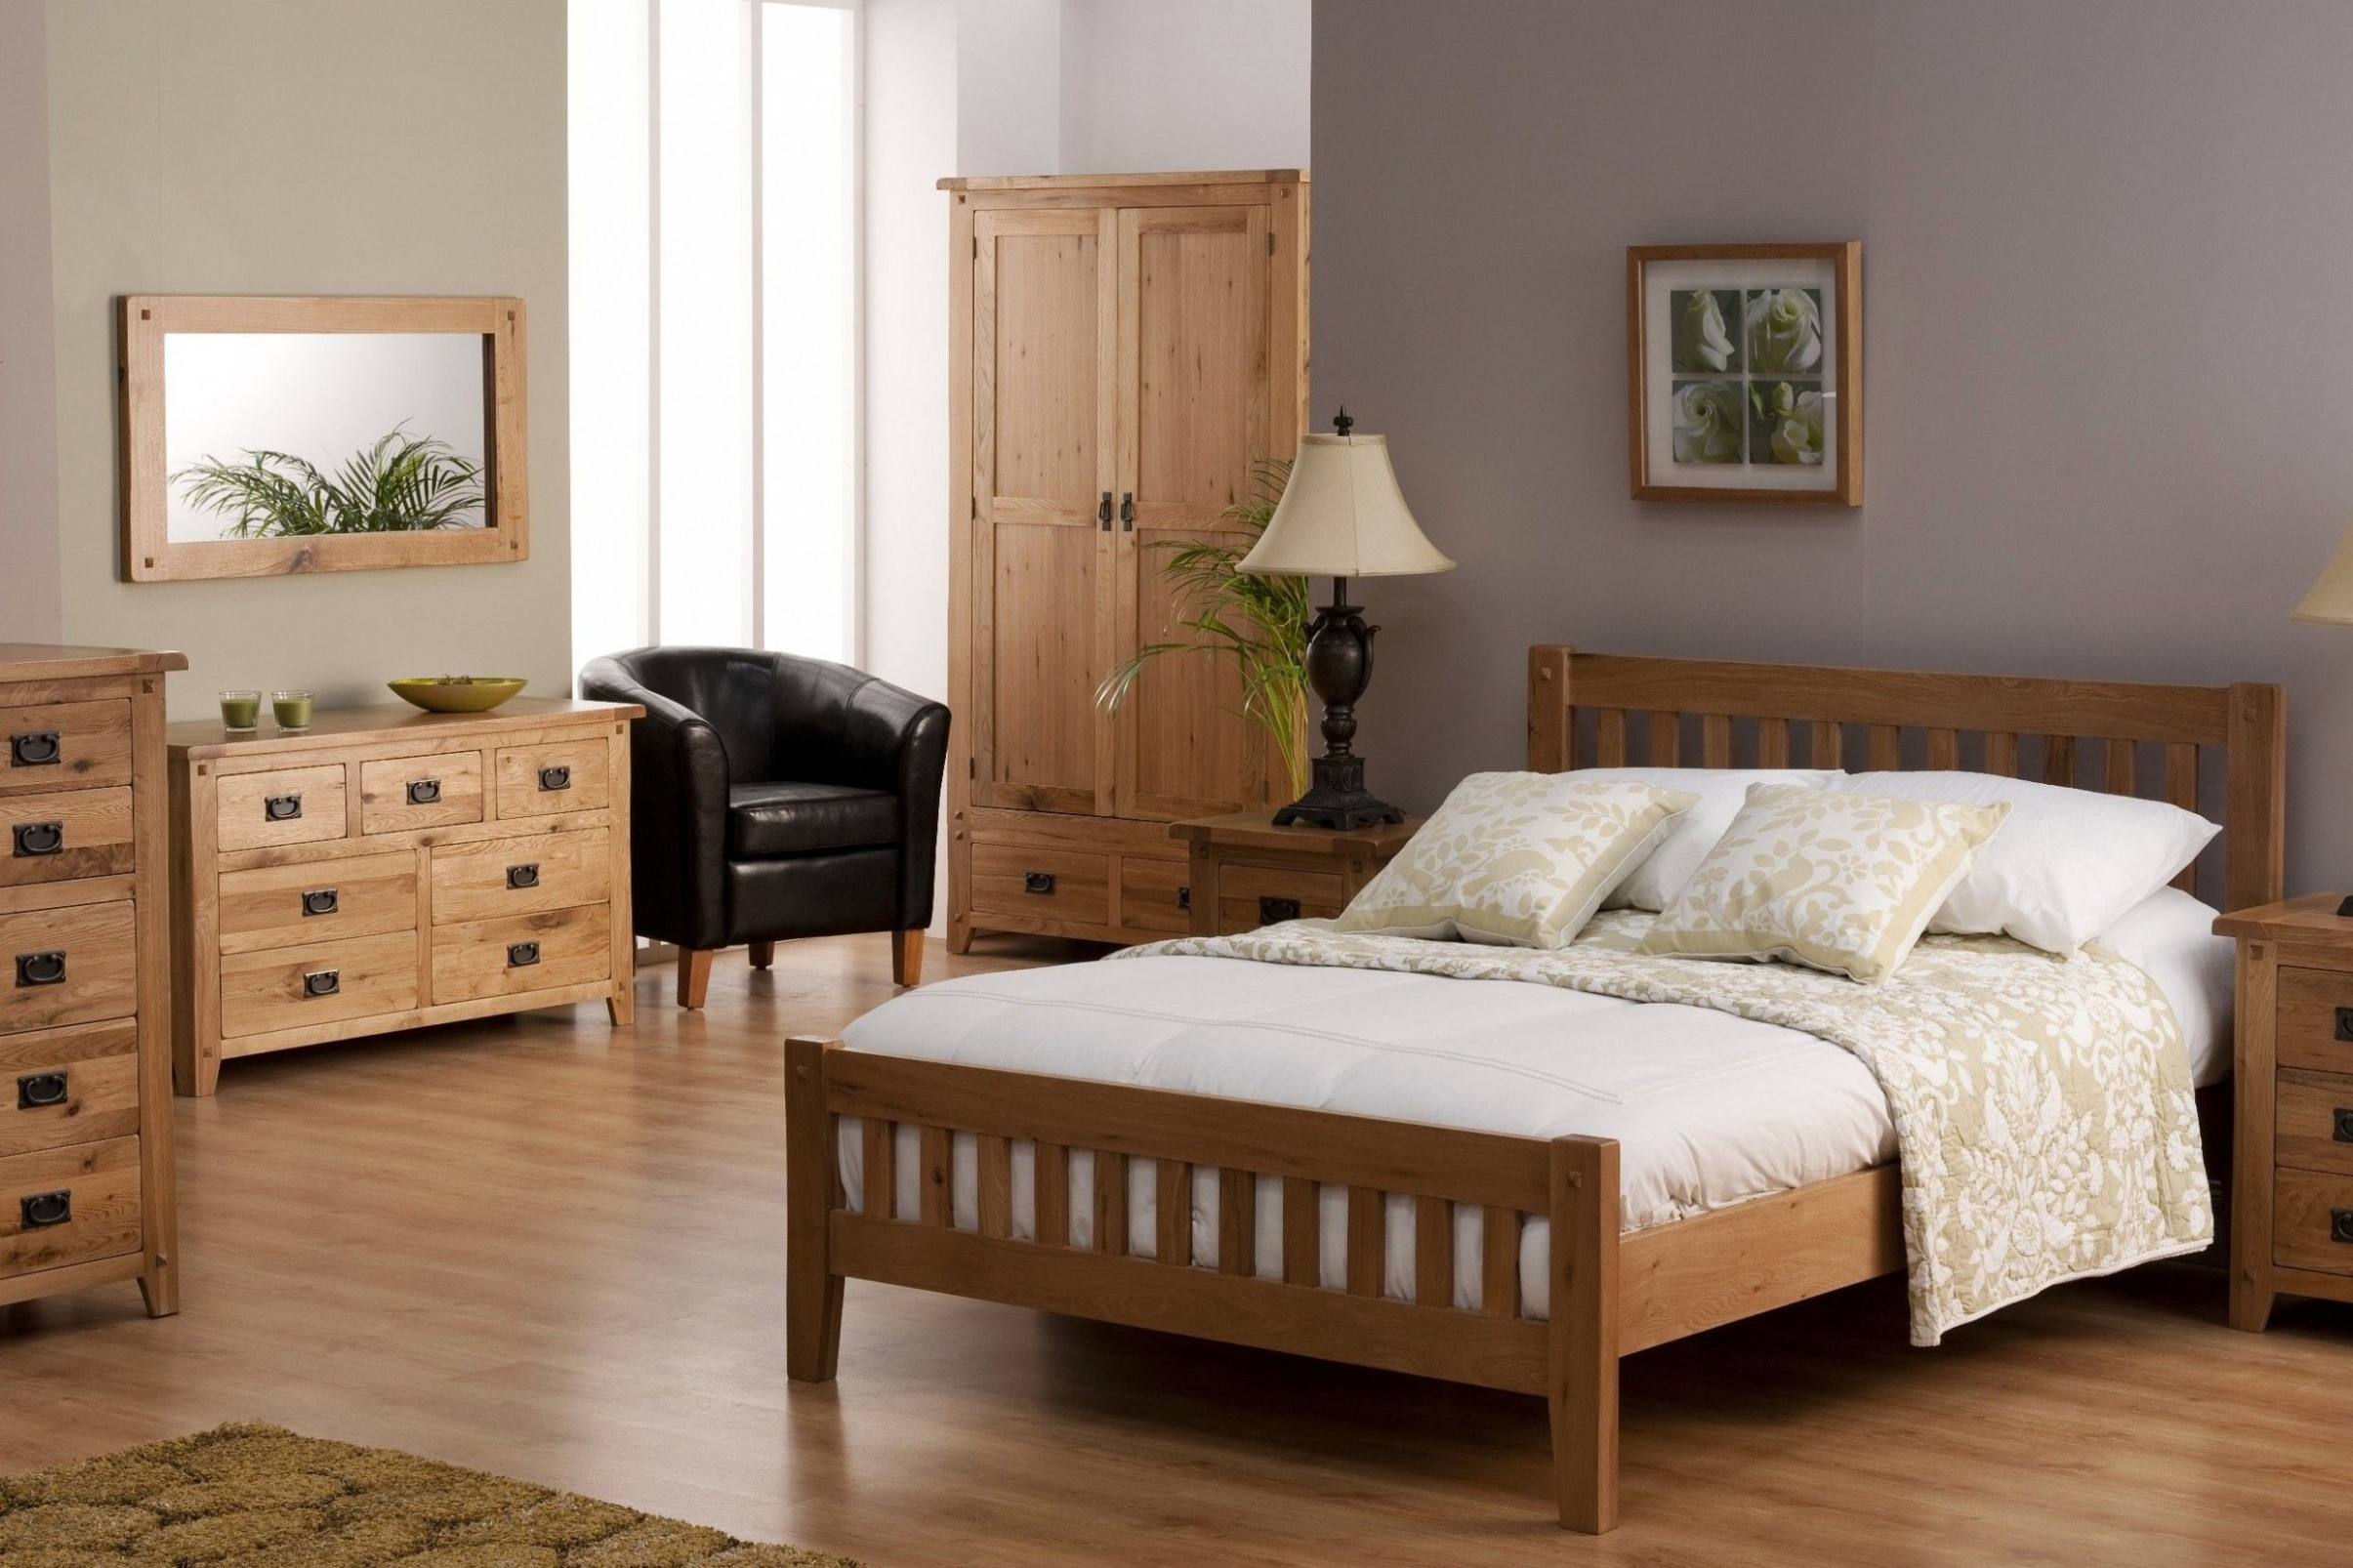 Bedroom Decorating Ideas Oak Furniture in 12  Bedroom colors  - Bedroom Ideas With Oak Furniture